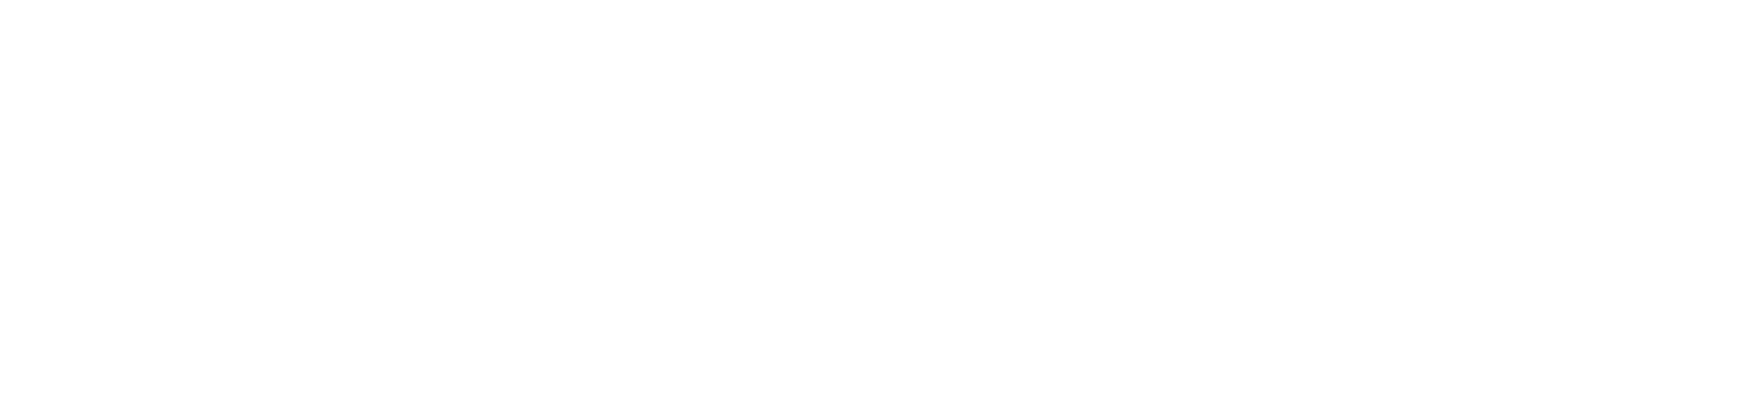 Rencast